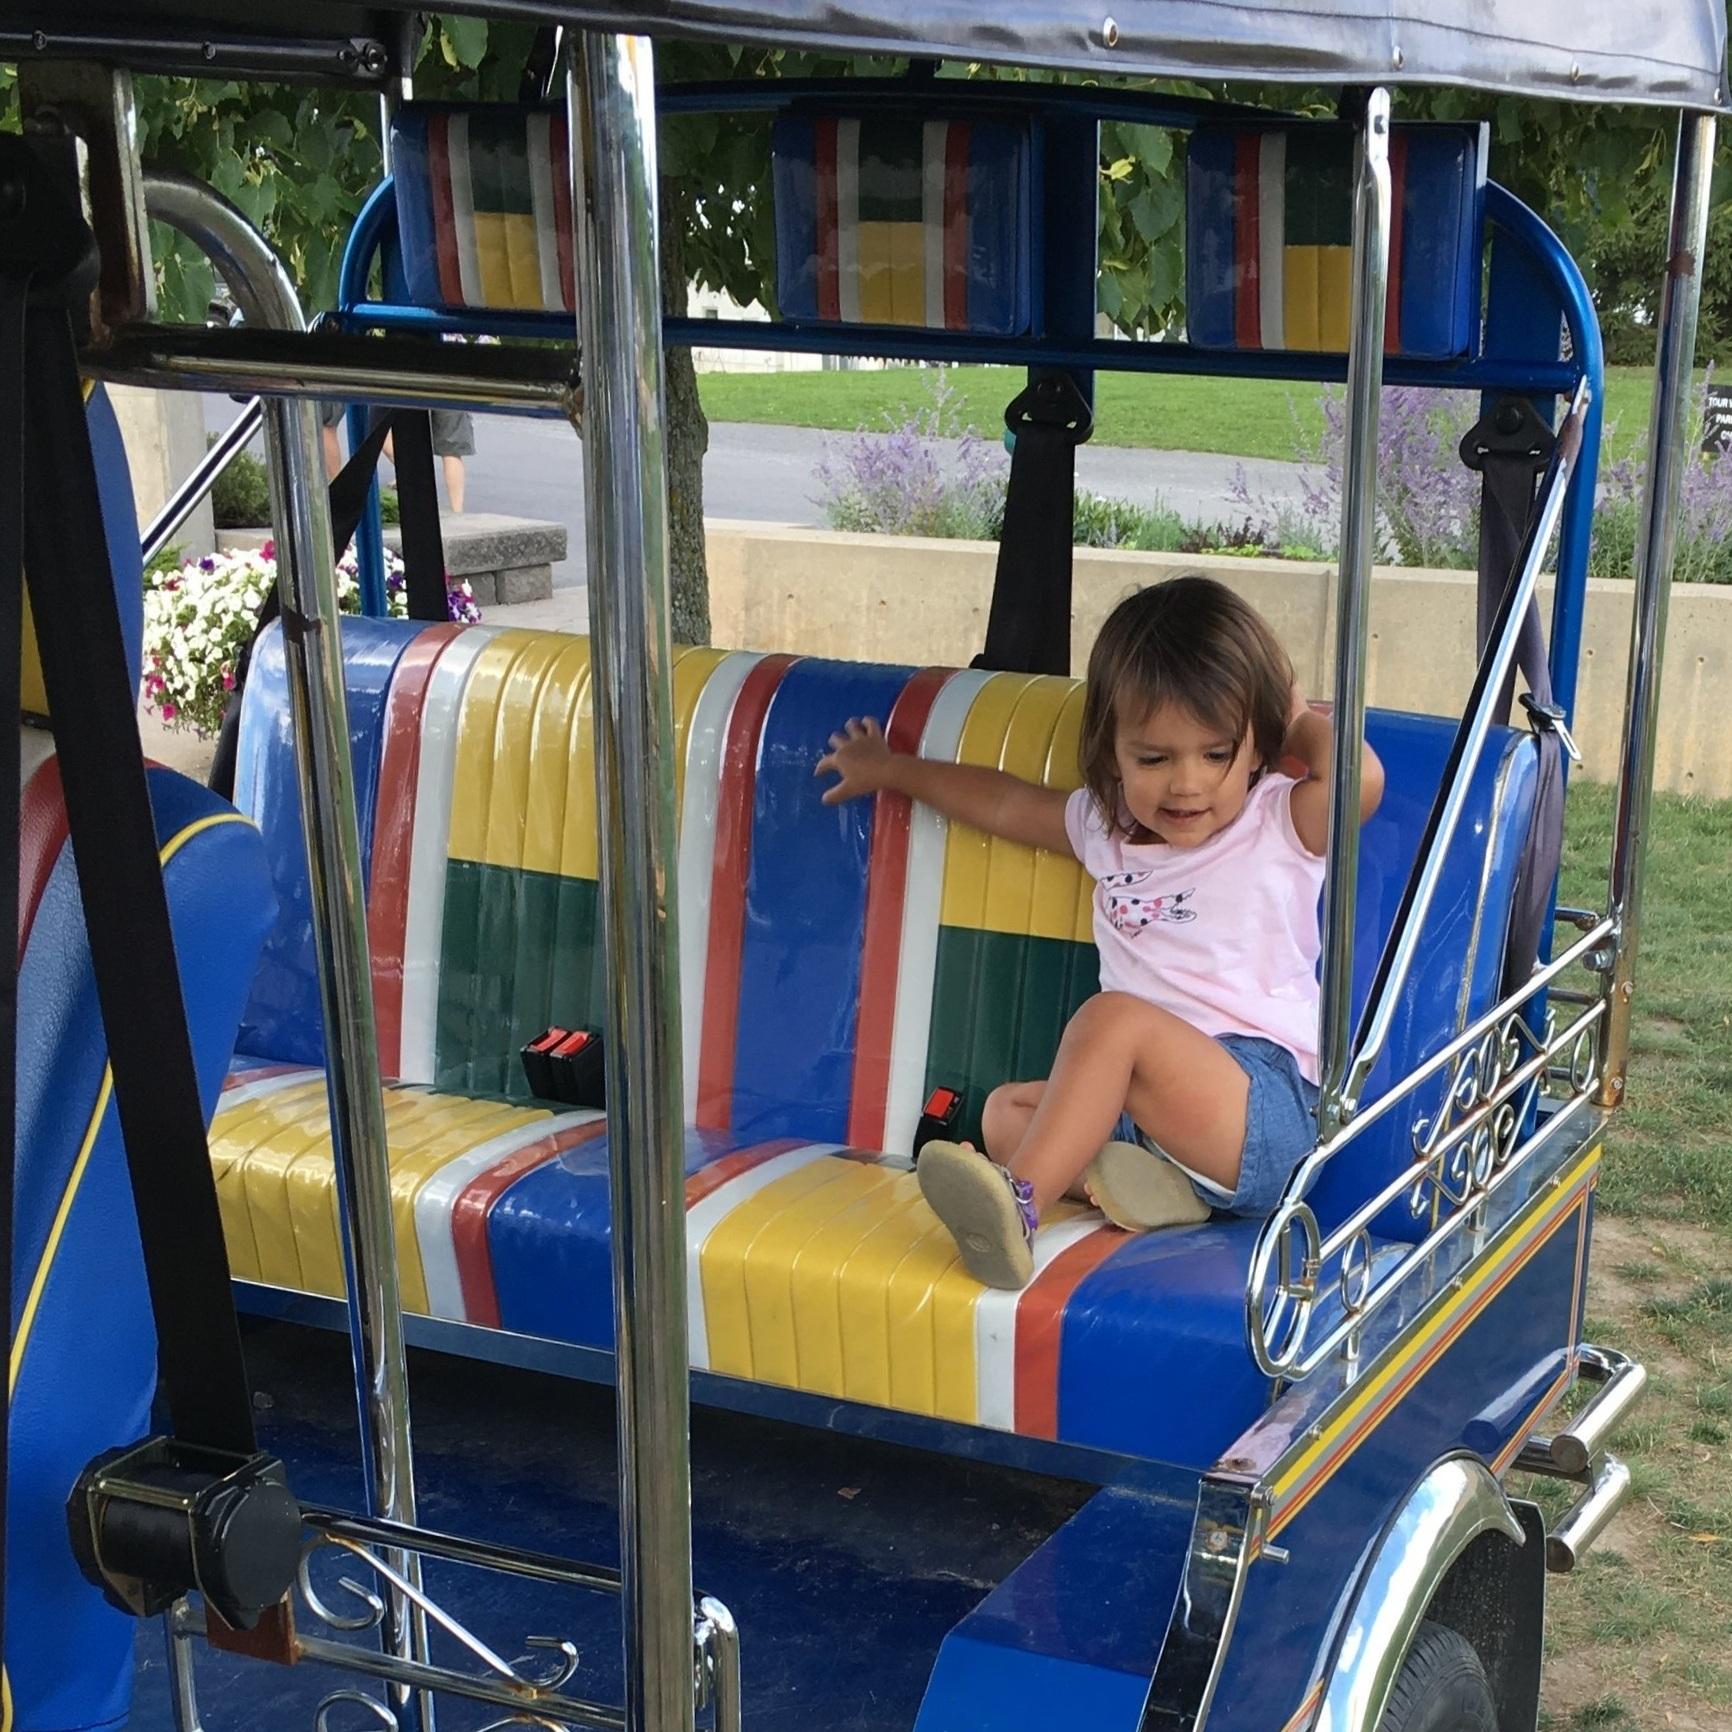 A sculpture garden, tuktuk and wood fire pizza make Prince Edward County's Karlo Estates kid-friendly.